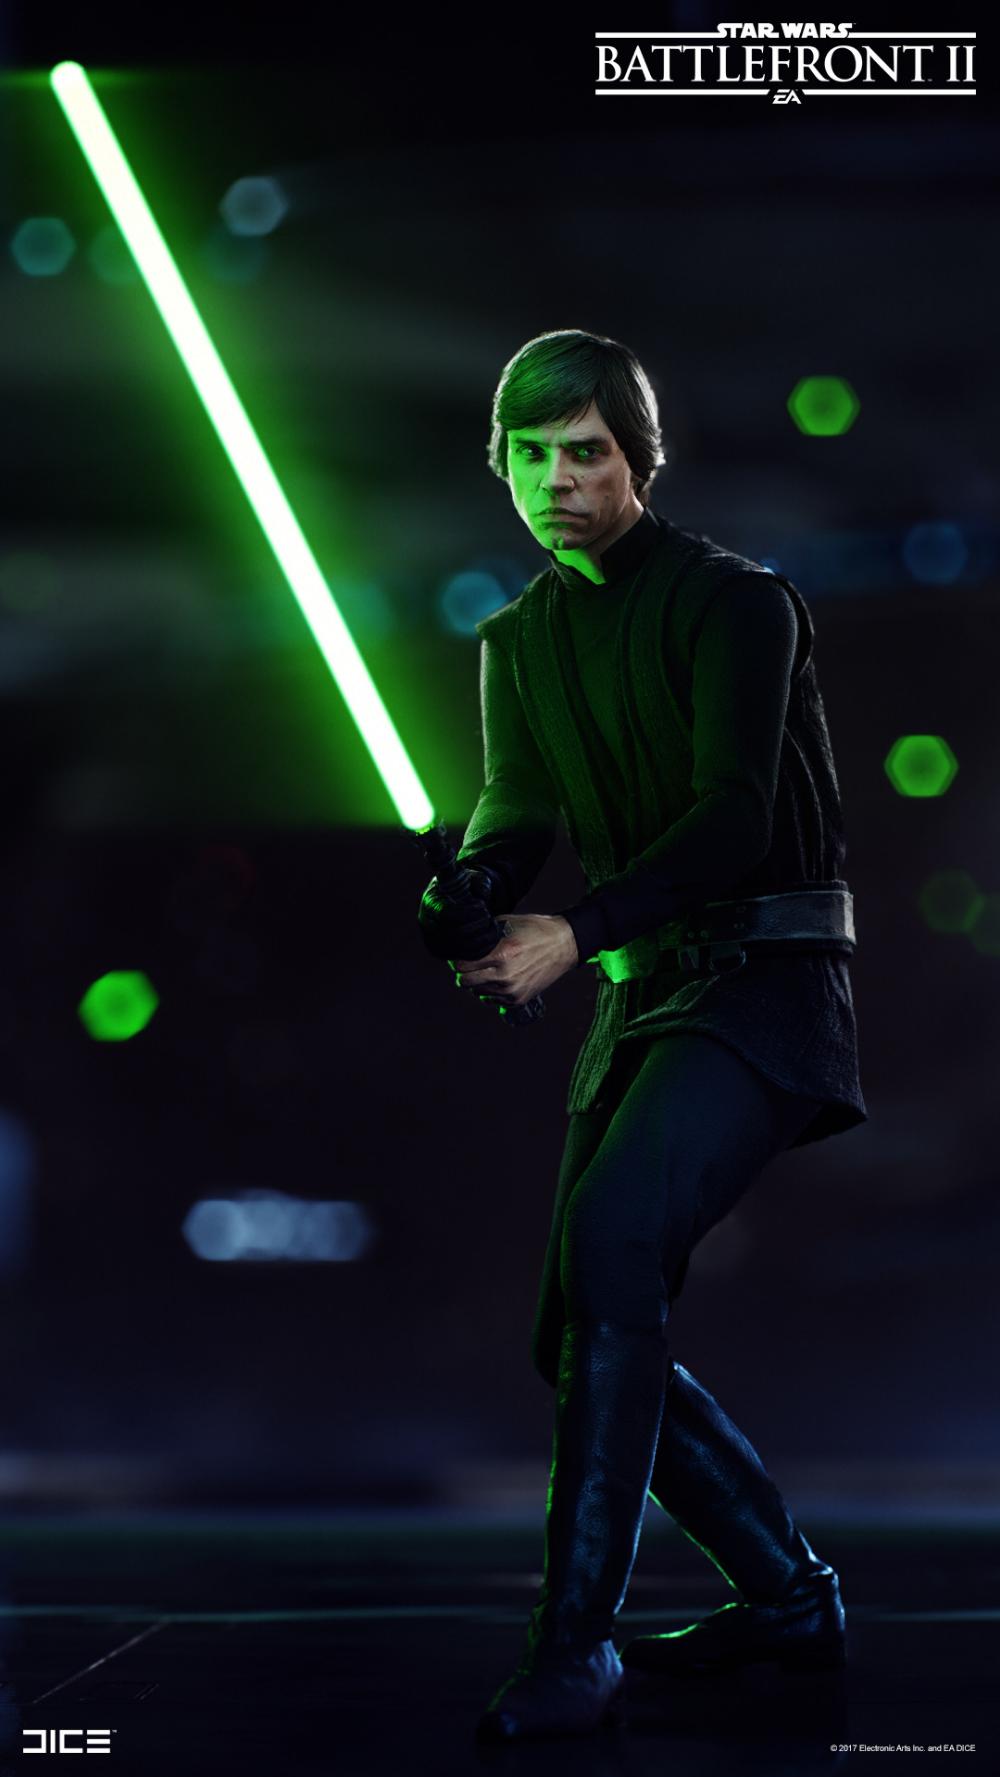 Artstation Star Wars Battlefront 2 Luke Skywalker Bjorn Arvidsson Star Wars Movies Posters Star Wars Wallpaper Star Wars Pictures